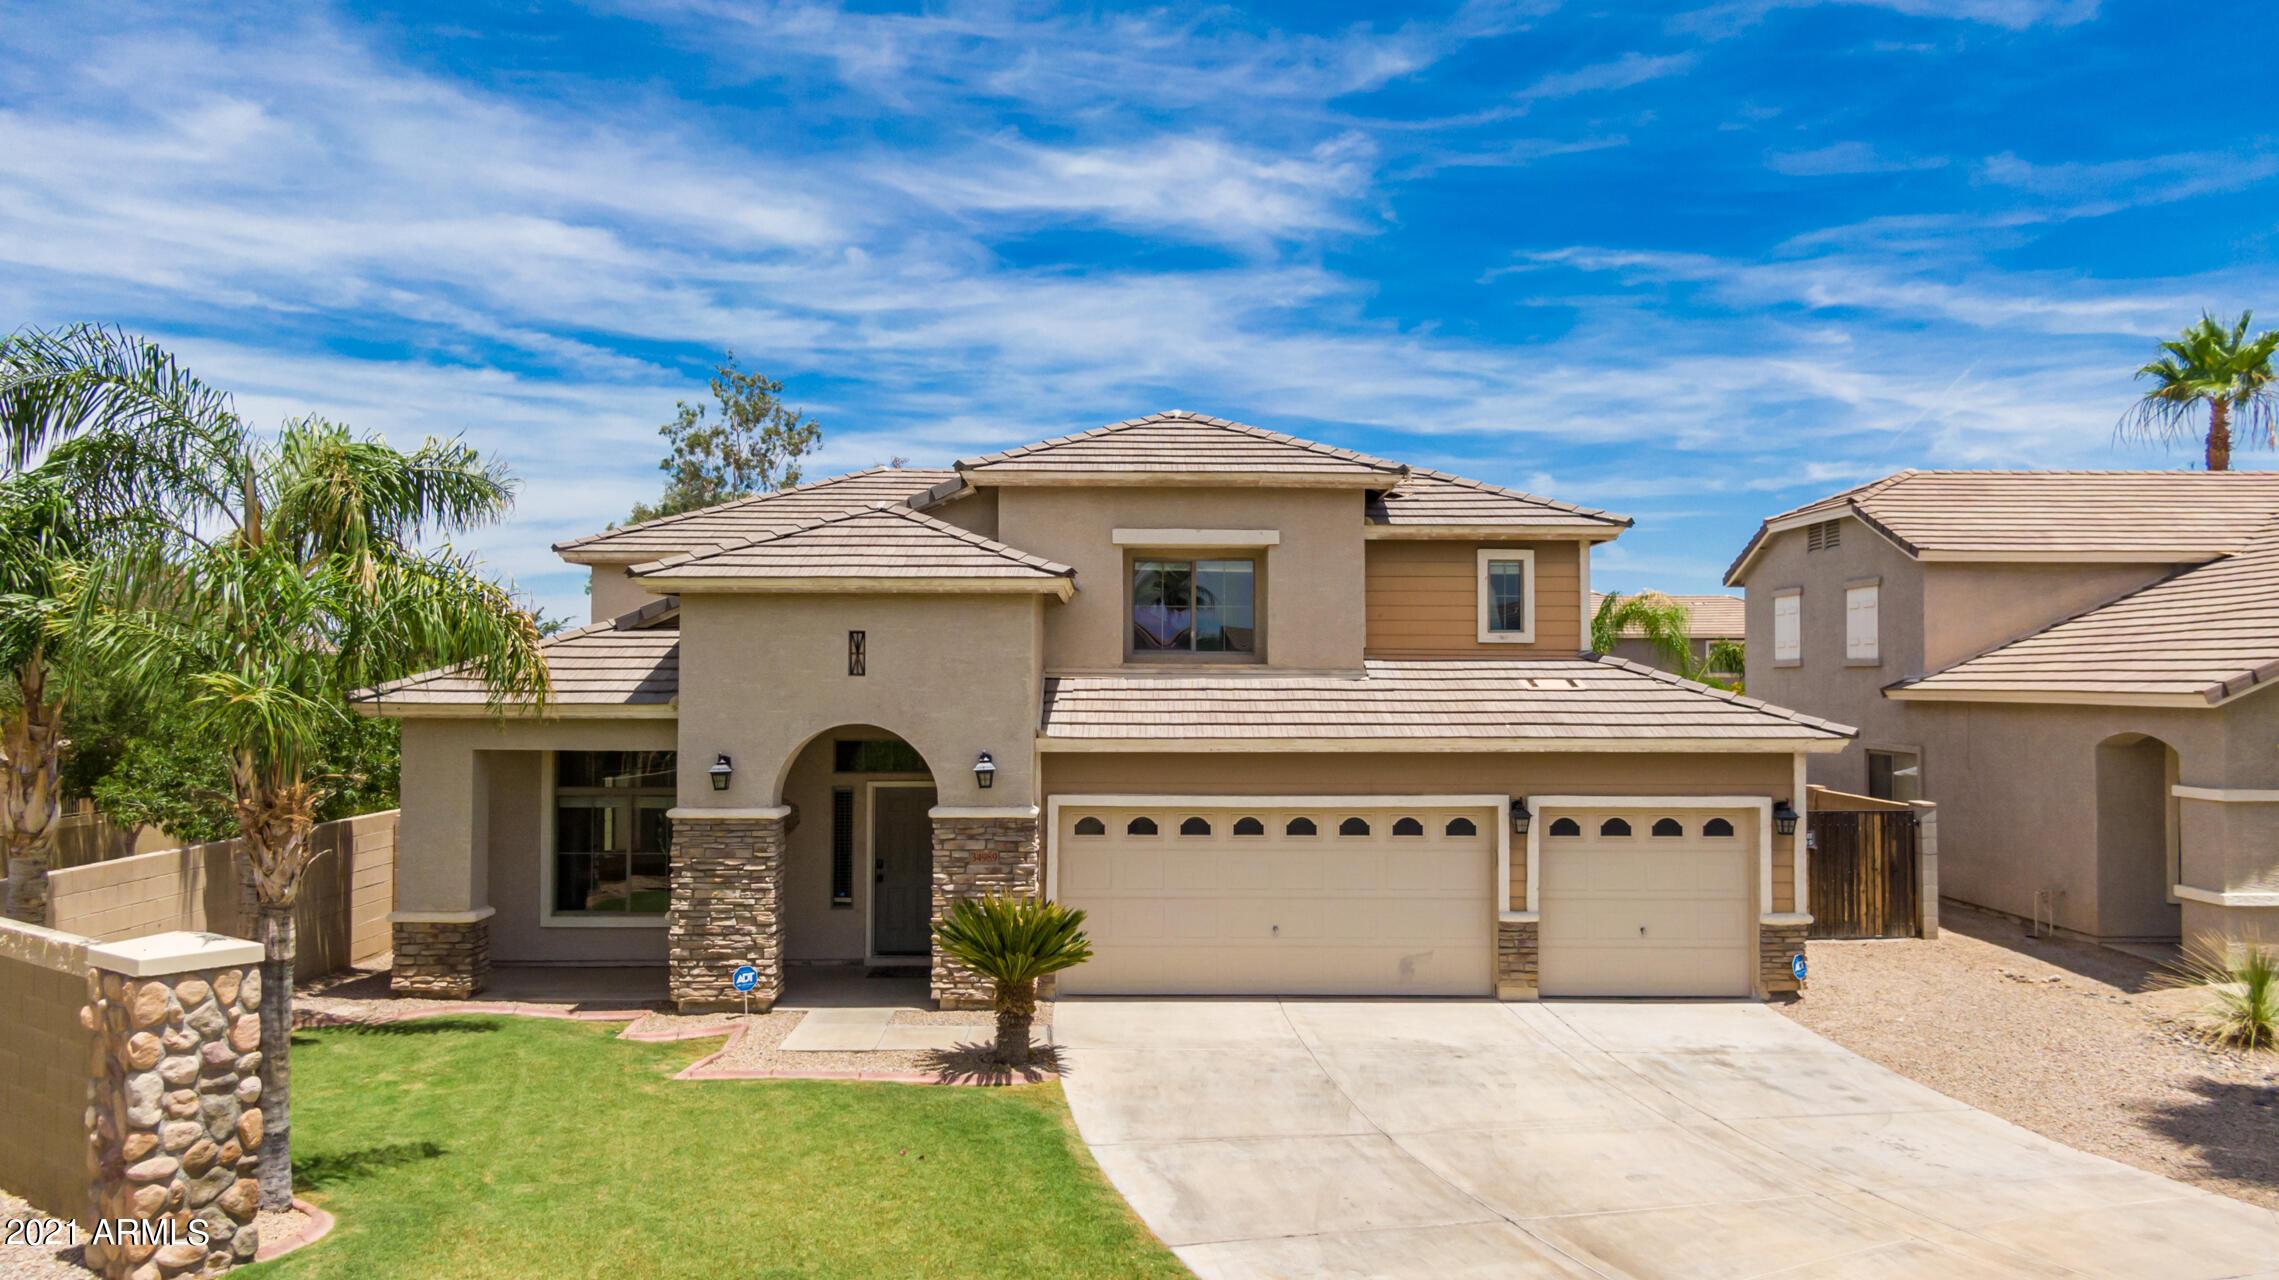 34989 STIRRUP Circle, Queen Creek, Arizona 85142, 3 Bedrooms Bedrooms, ,2.5 BathroomsBathrooms,Residential,For Sale,STIRRUP,6248970